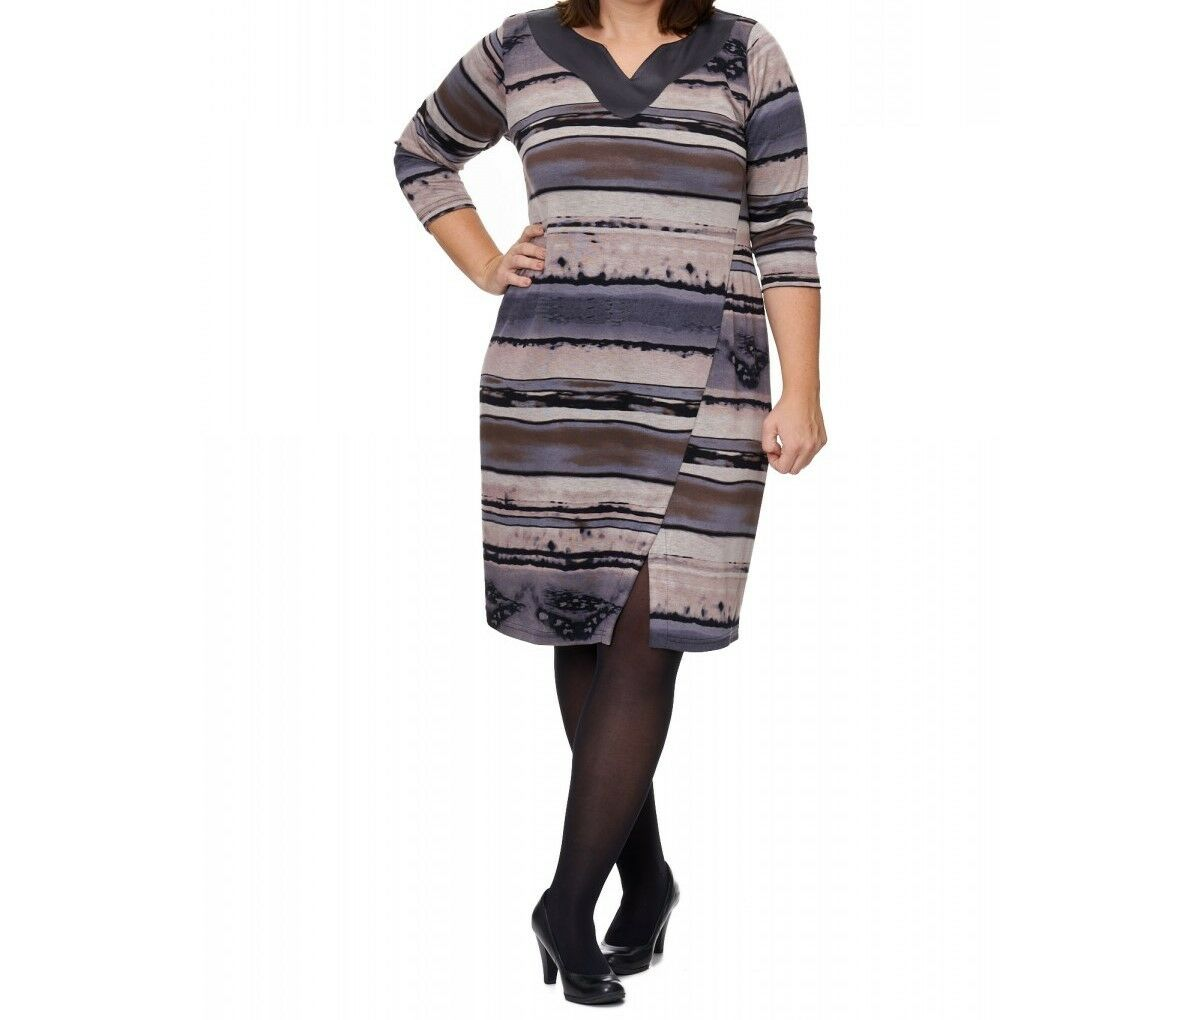 OPHILIA  elegantes Traum Kleid mehrfarbig, Lederimitat, 52 - 54 anstatt